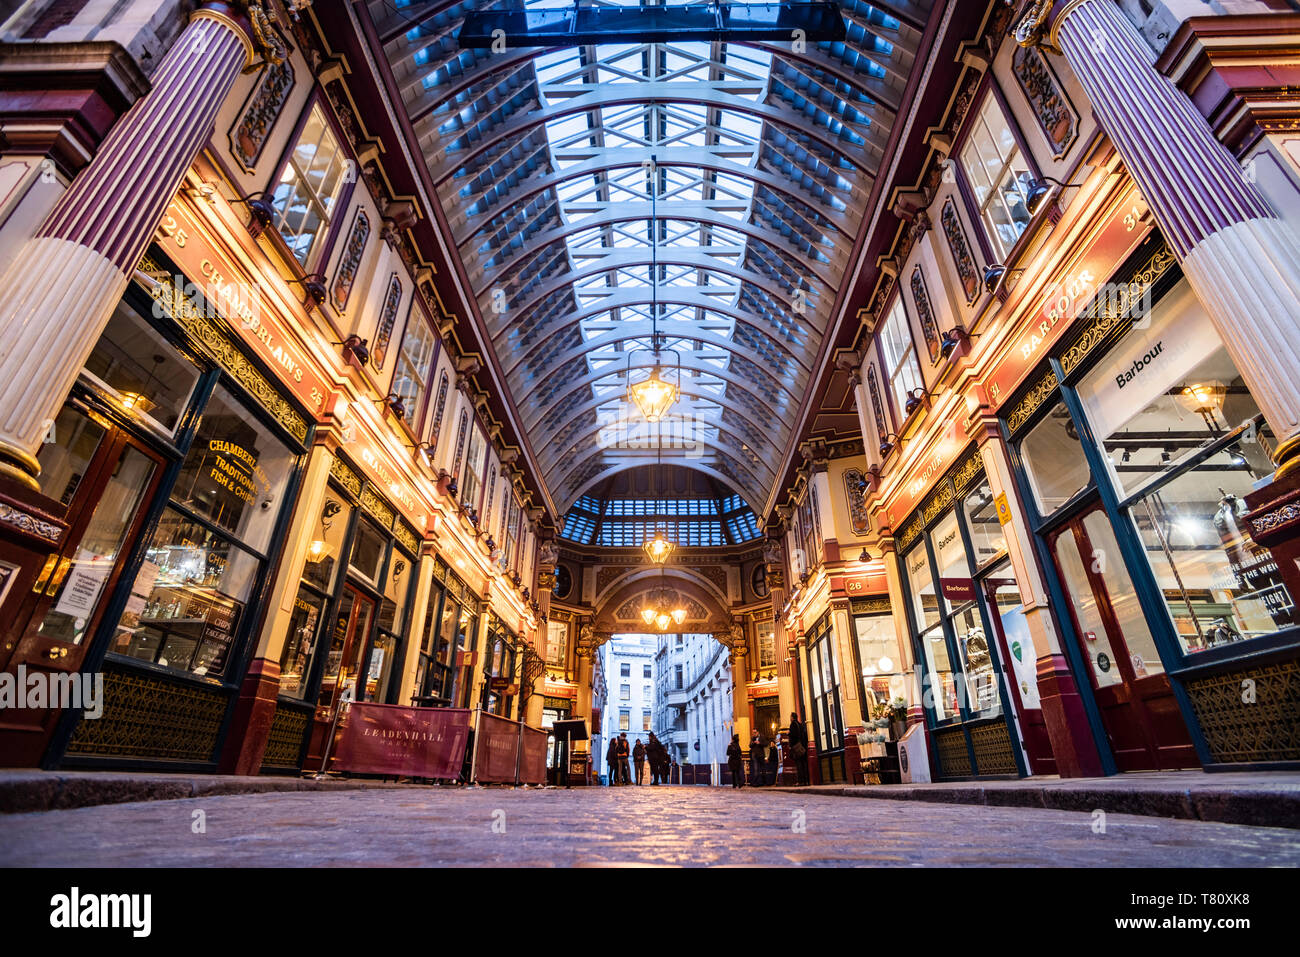 Mercato Leadenhall, City of London, Londra, Inghilterra, Regno Unito, Europa Foto Stock